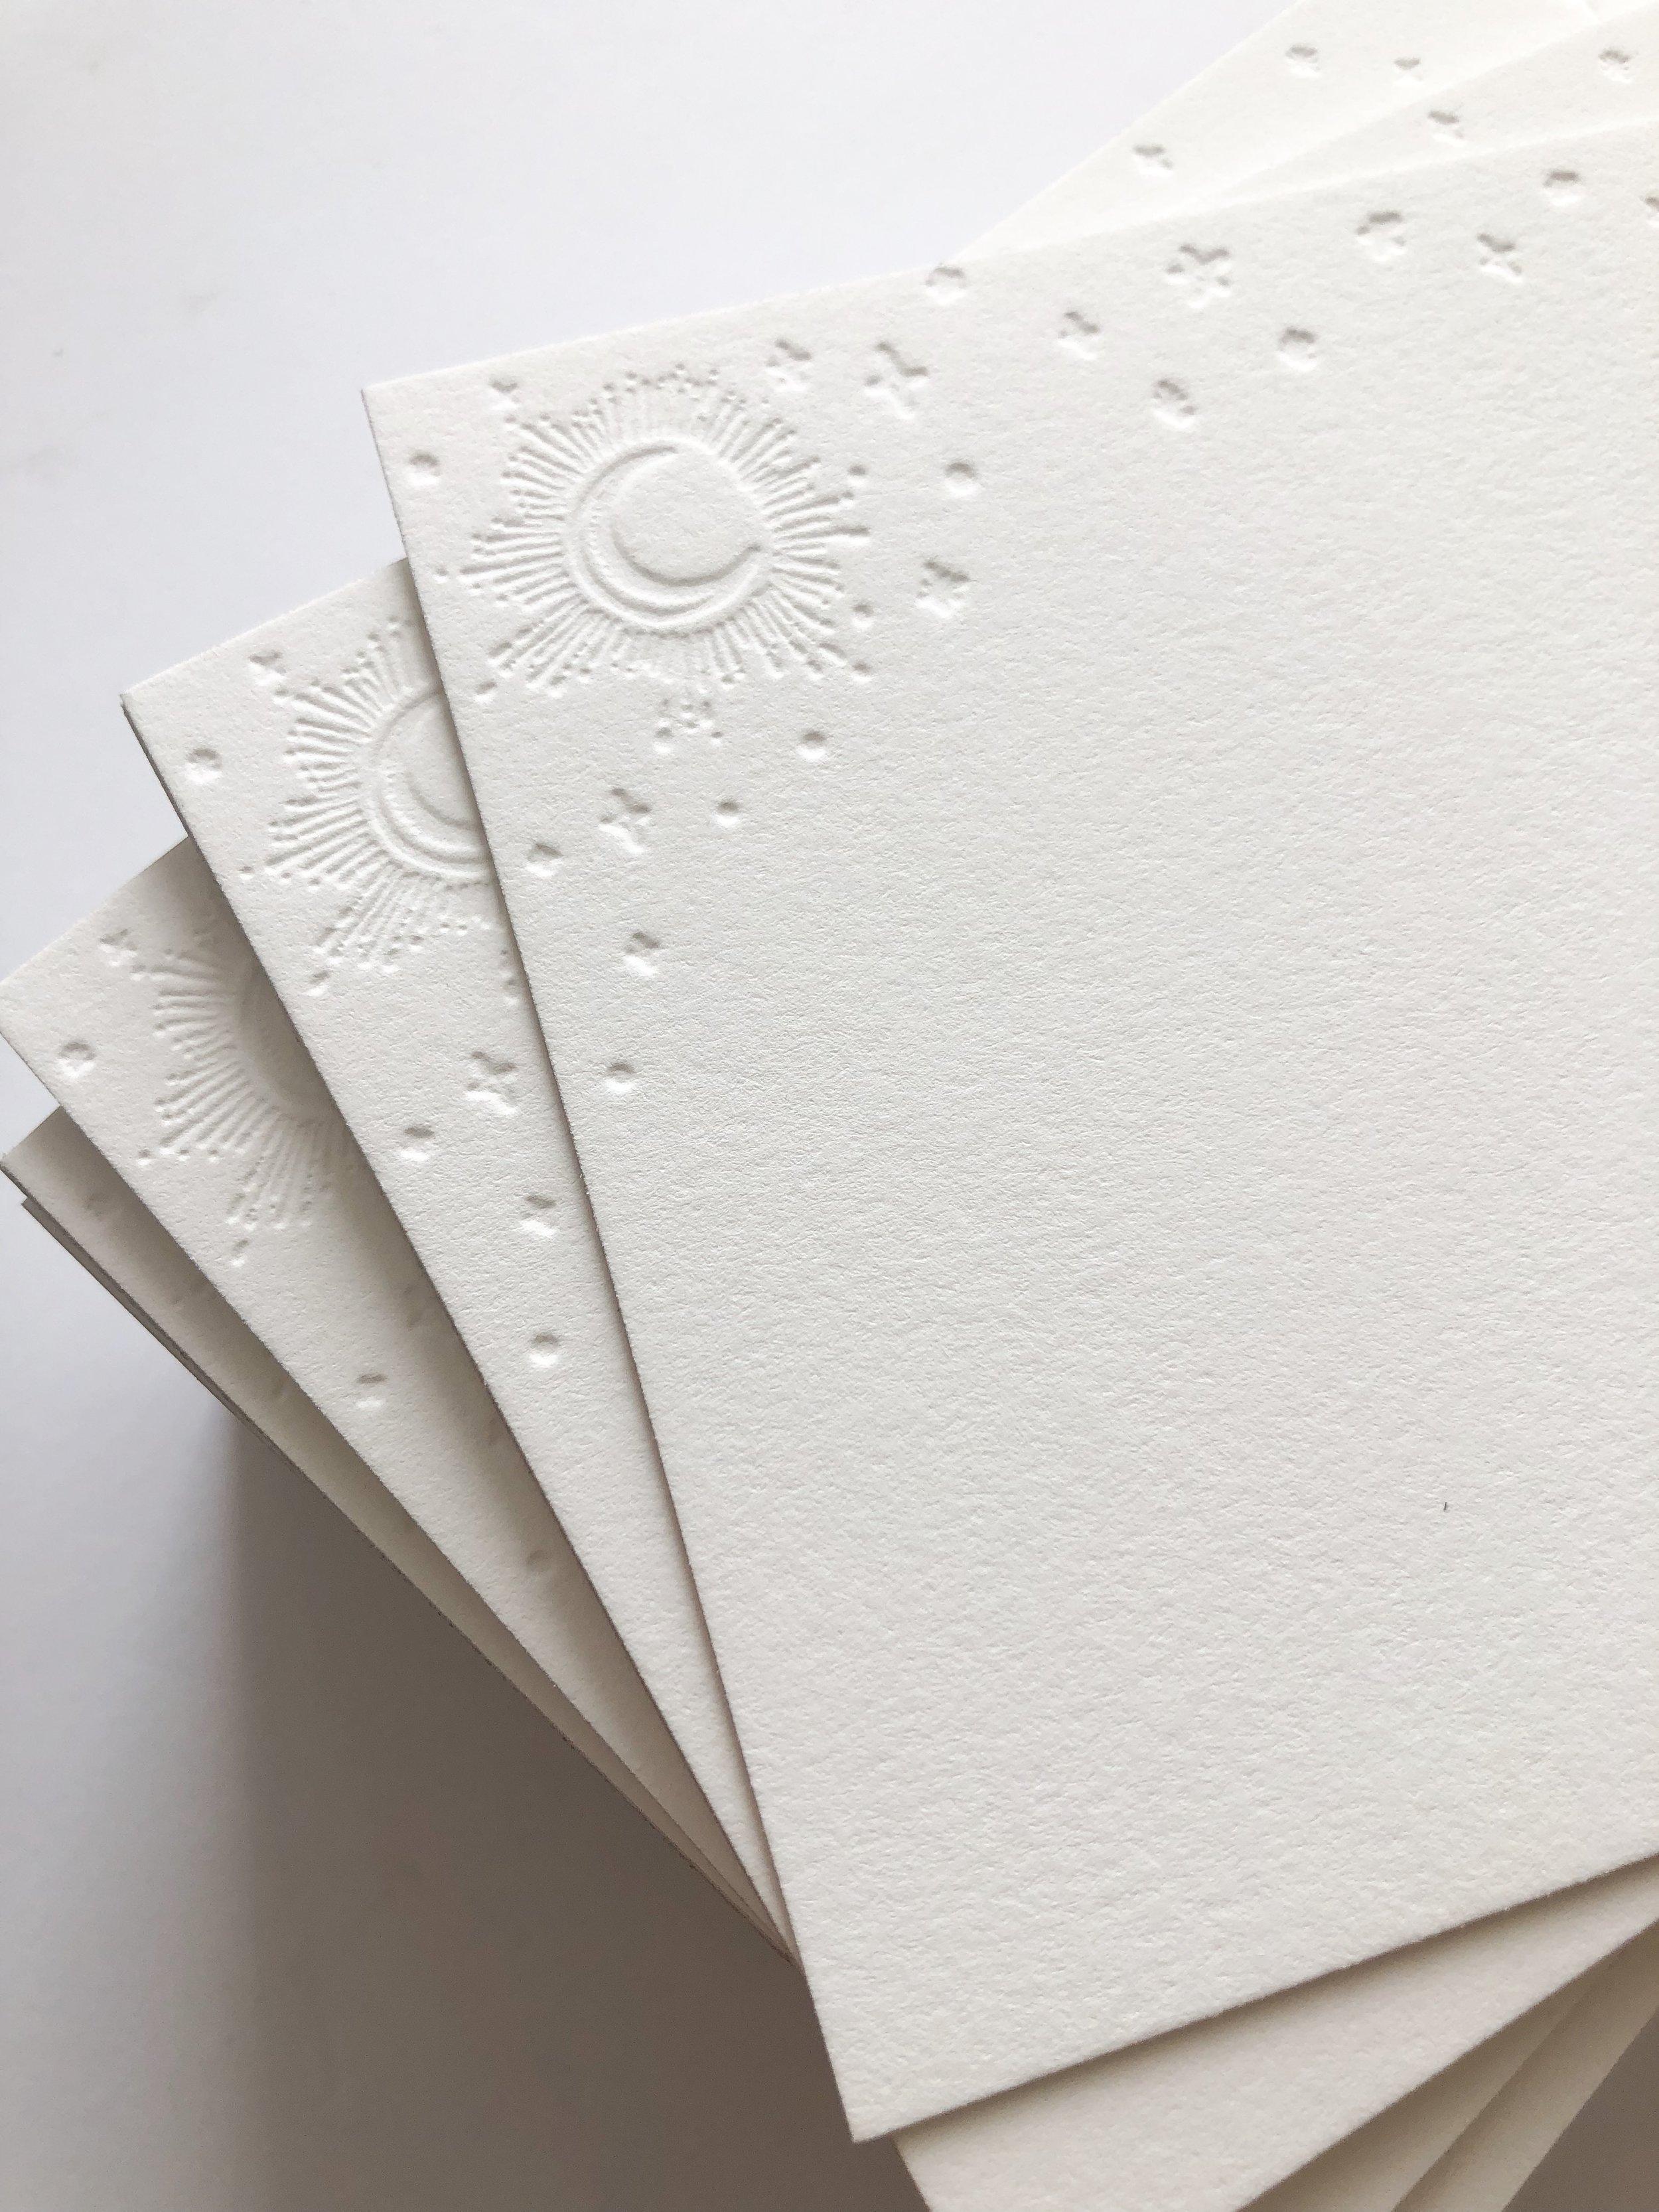 Swell Press Notecards Celestial.JPG